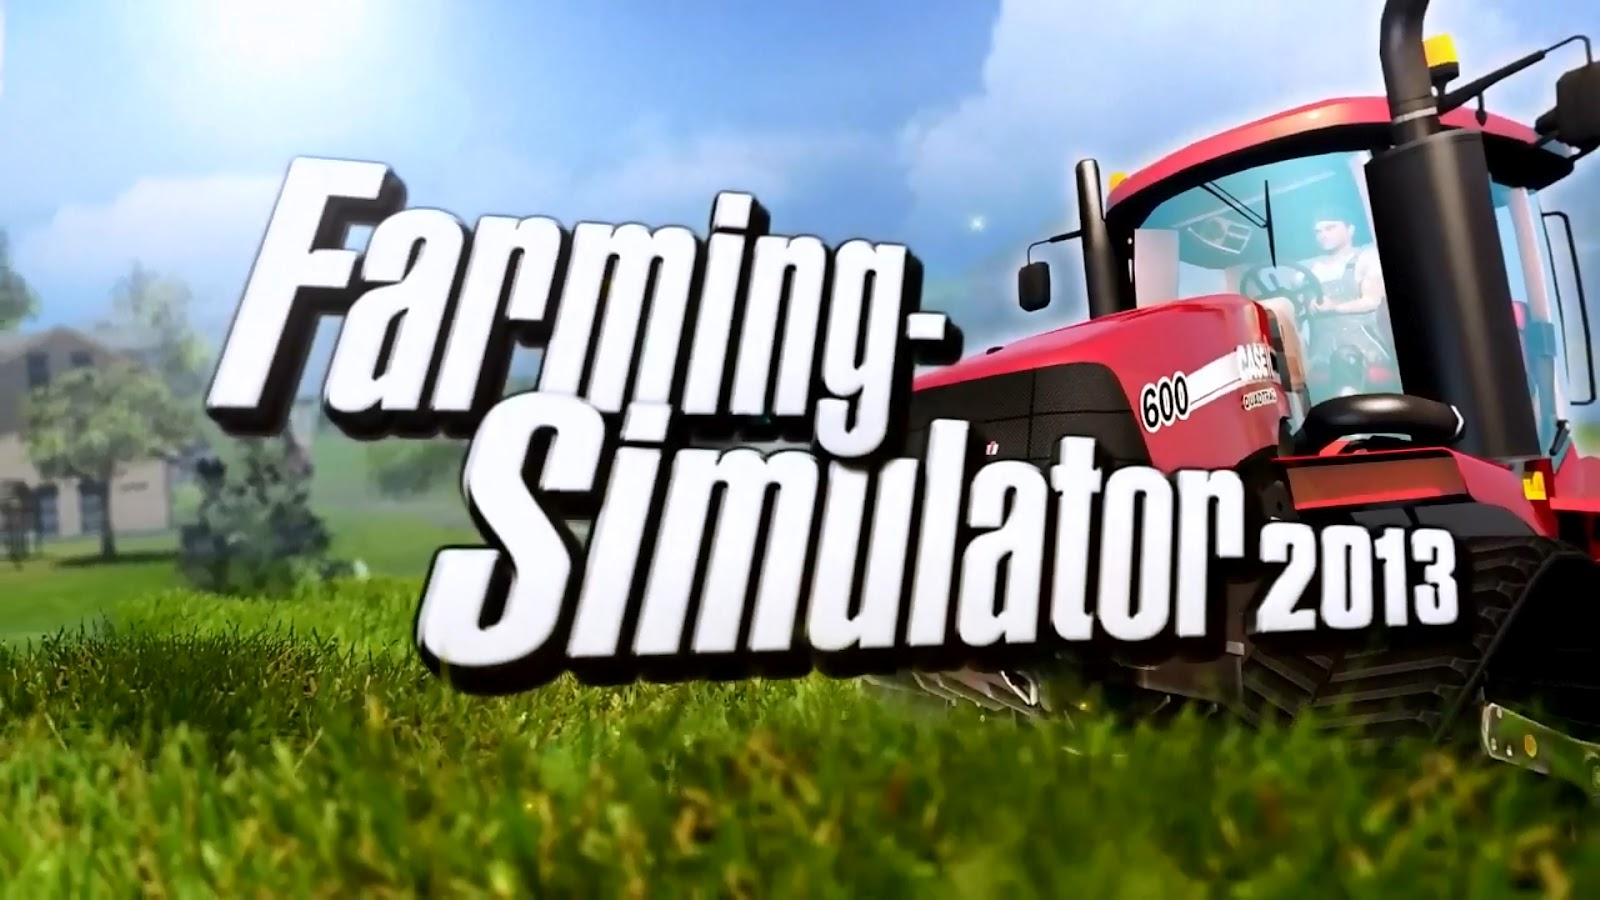 Farming Simulator 2013 llega a consolas con un trailer a tono con la ocasión [GTA Killer]